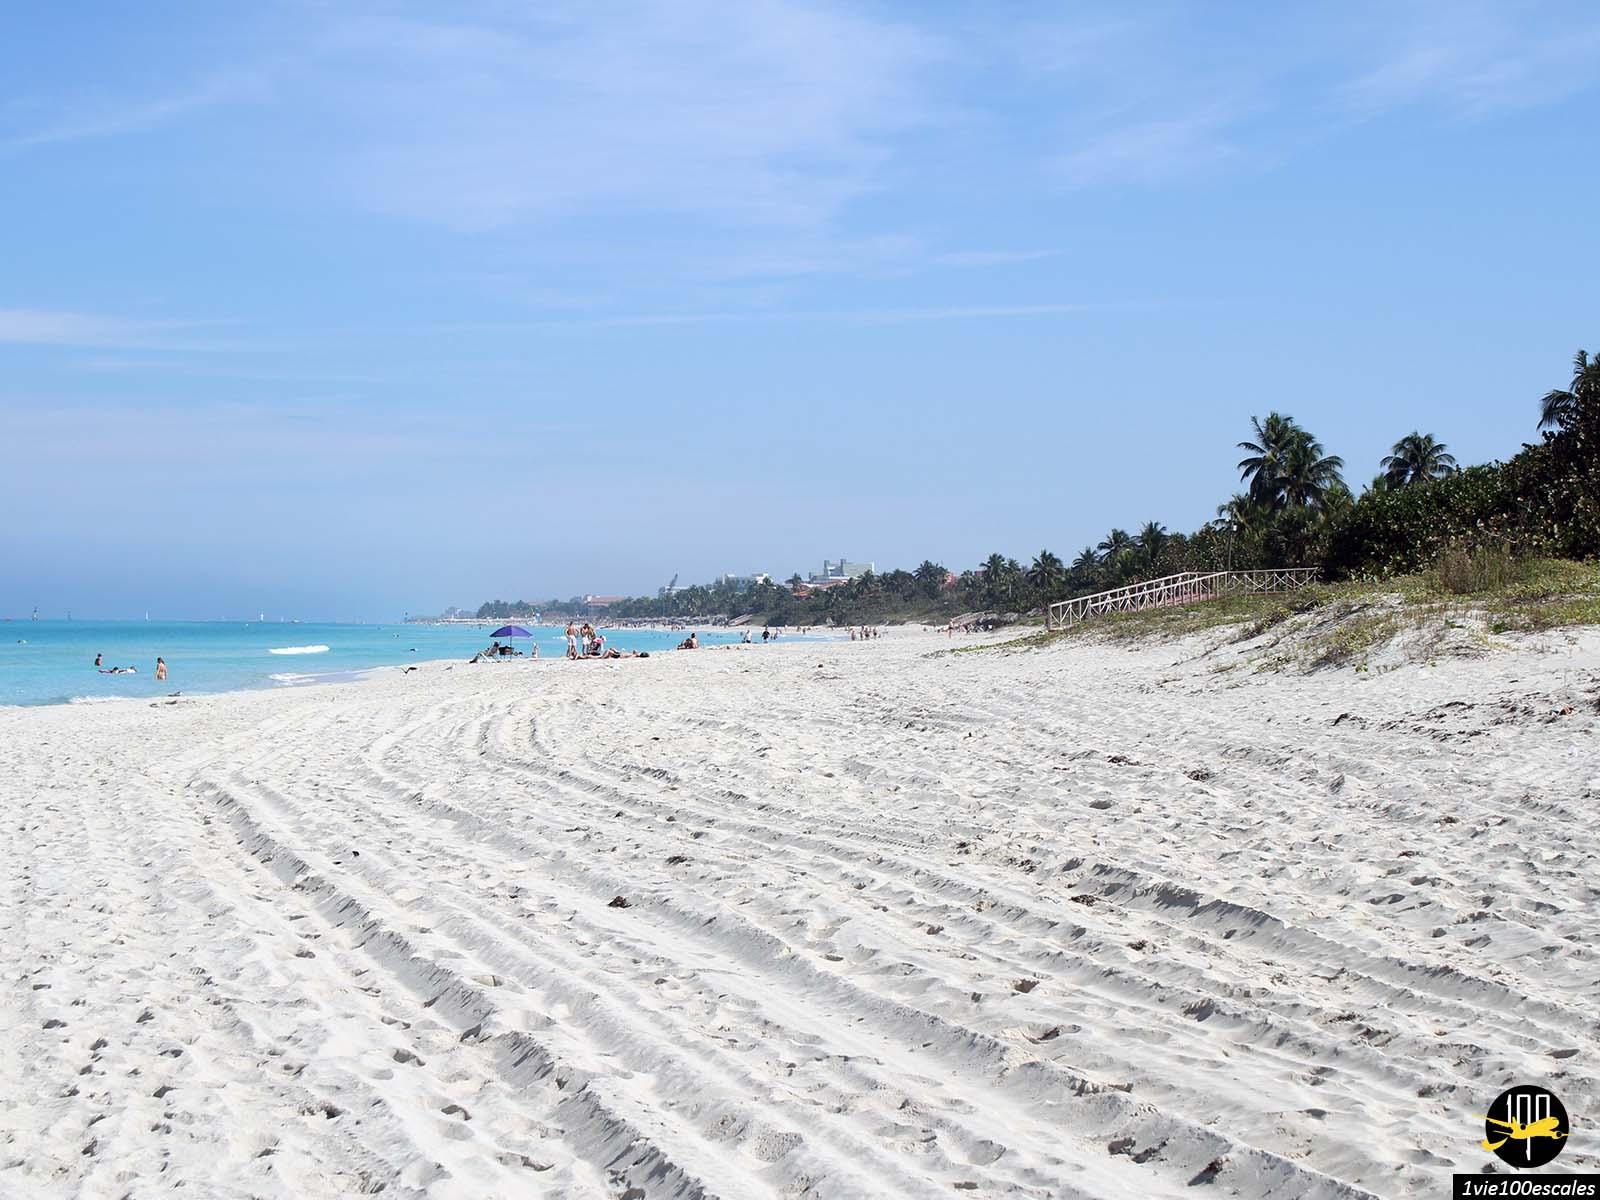 Le sable de la plage de Varadero à Cuba